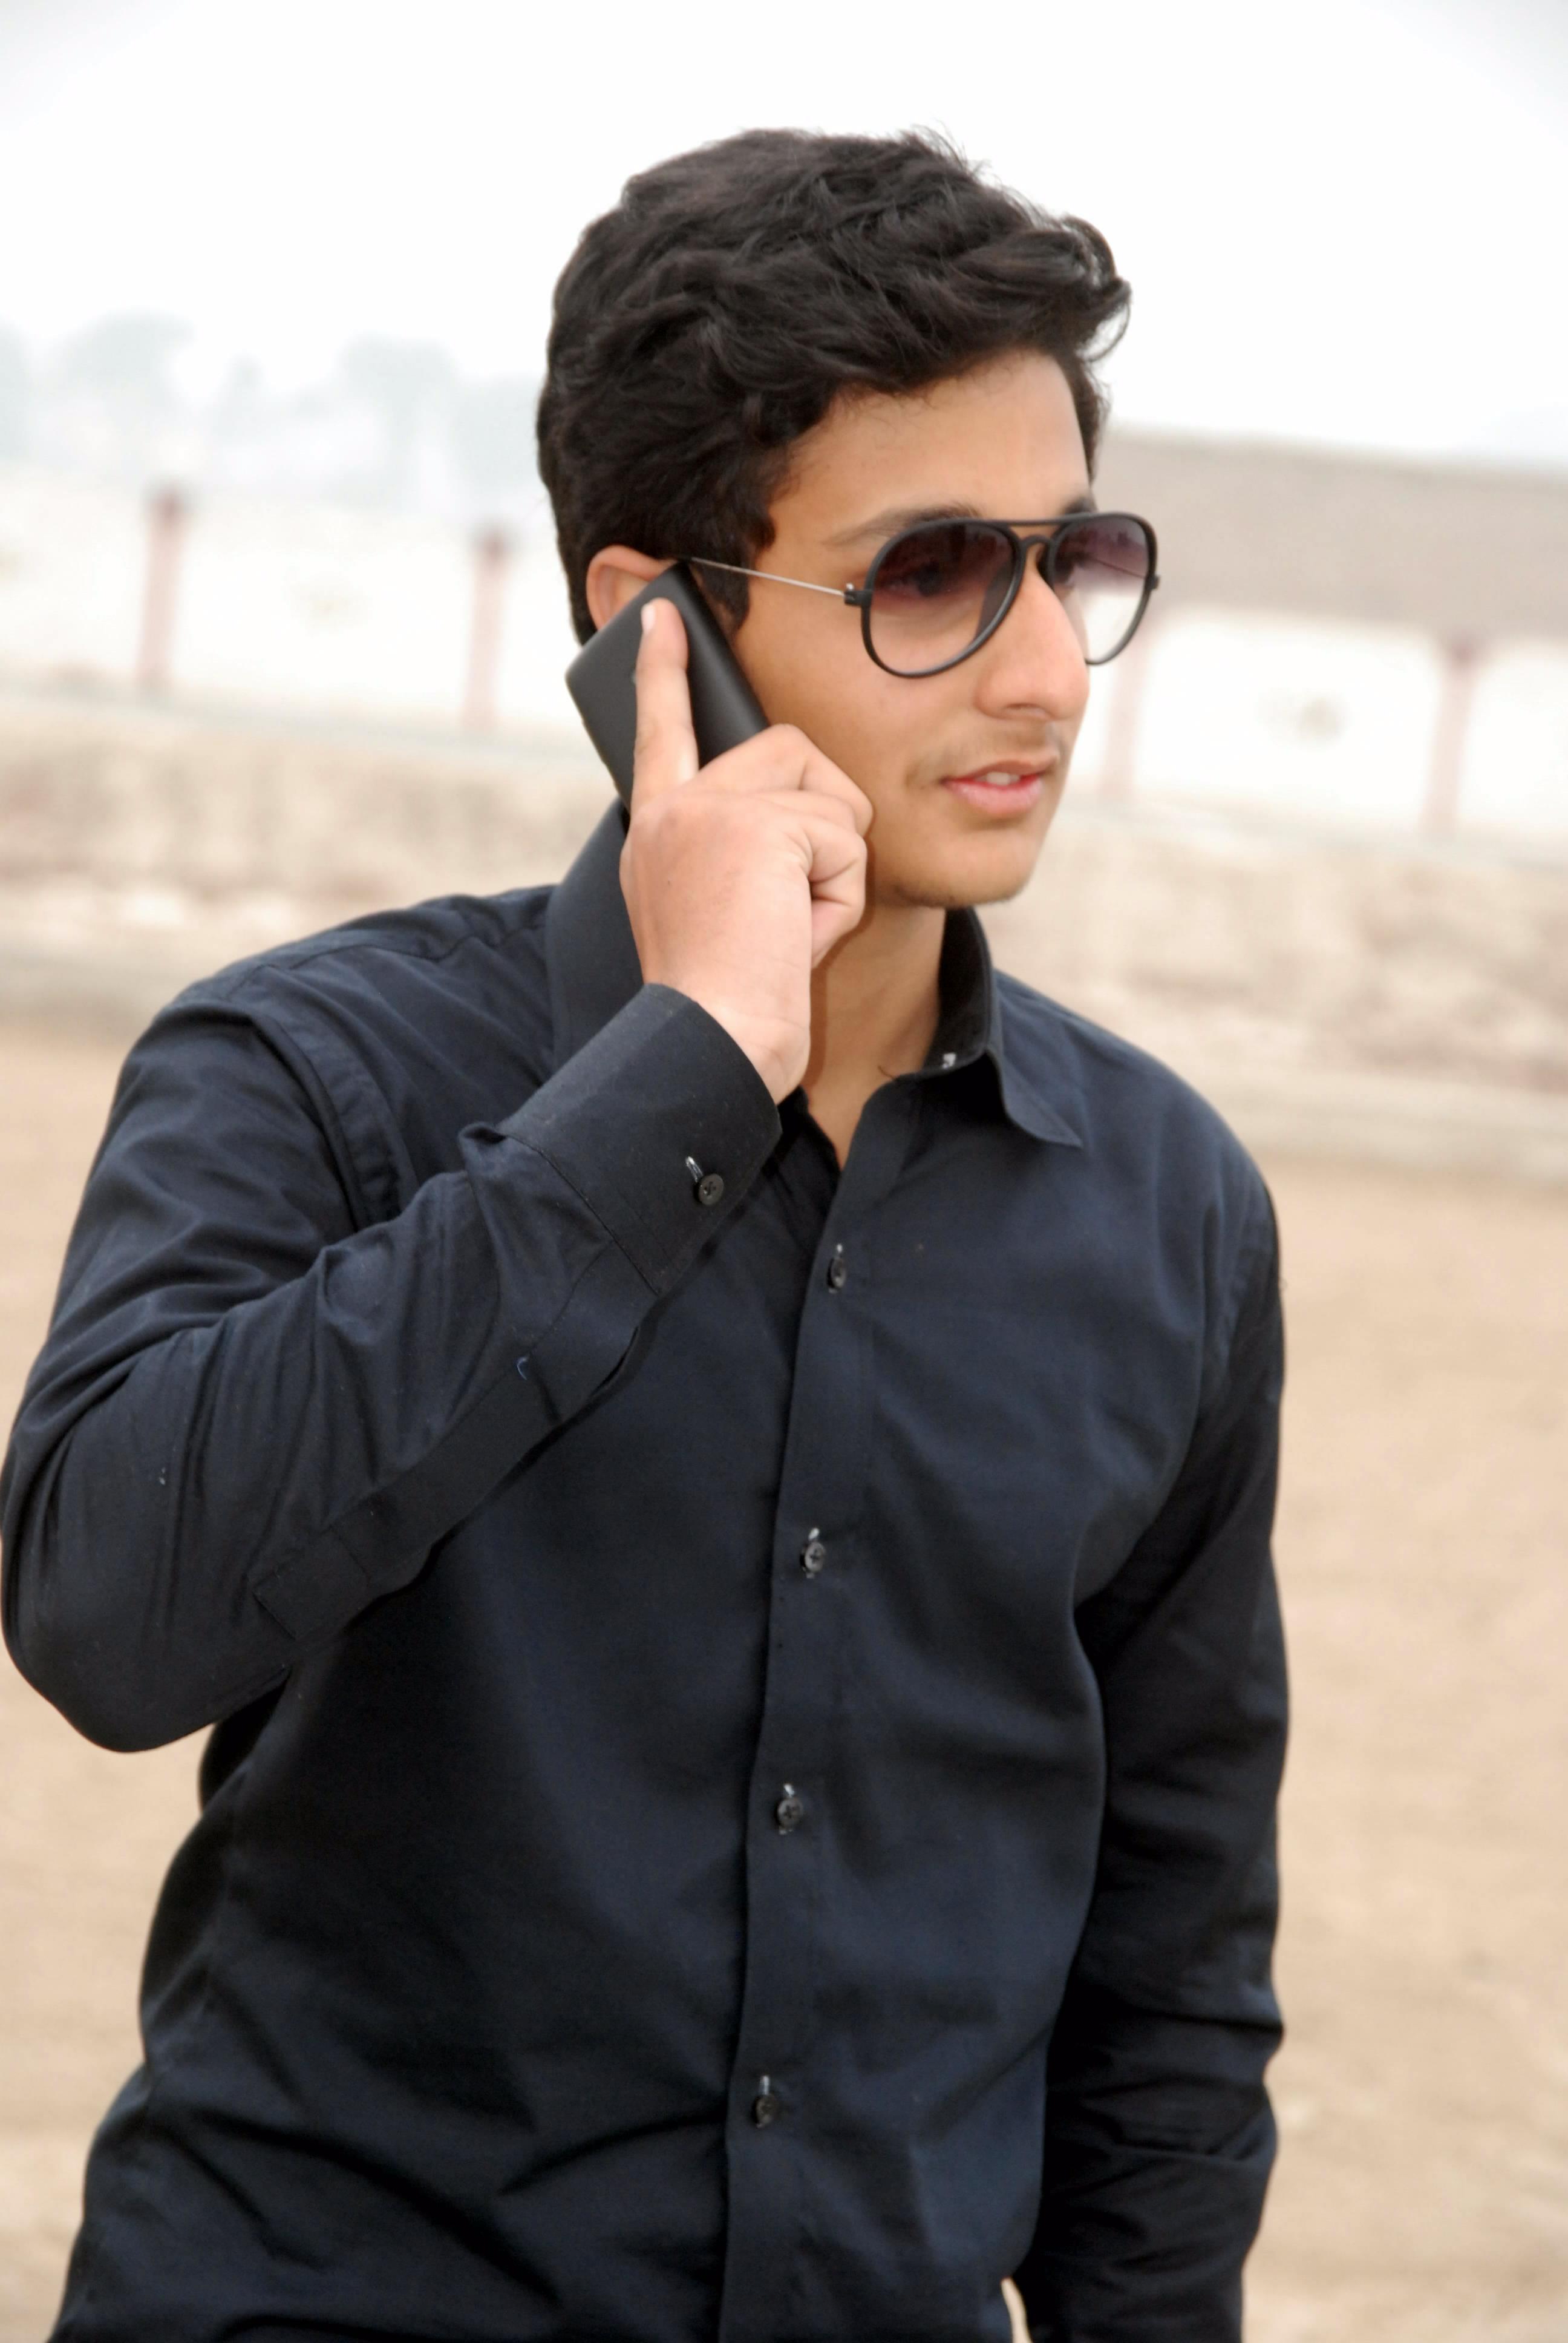 Ahmad Dar